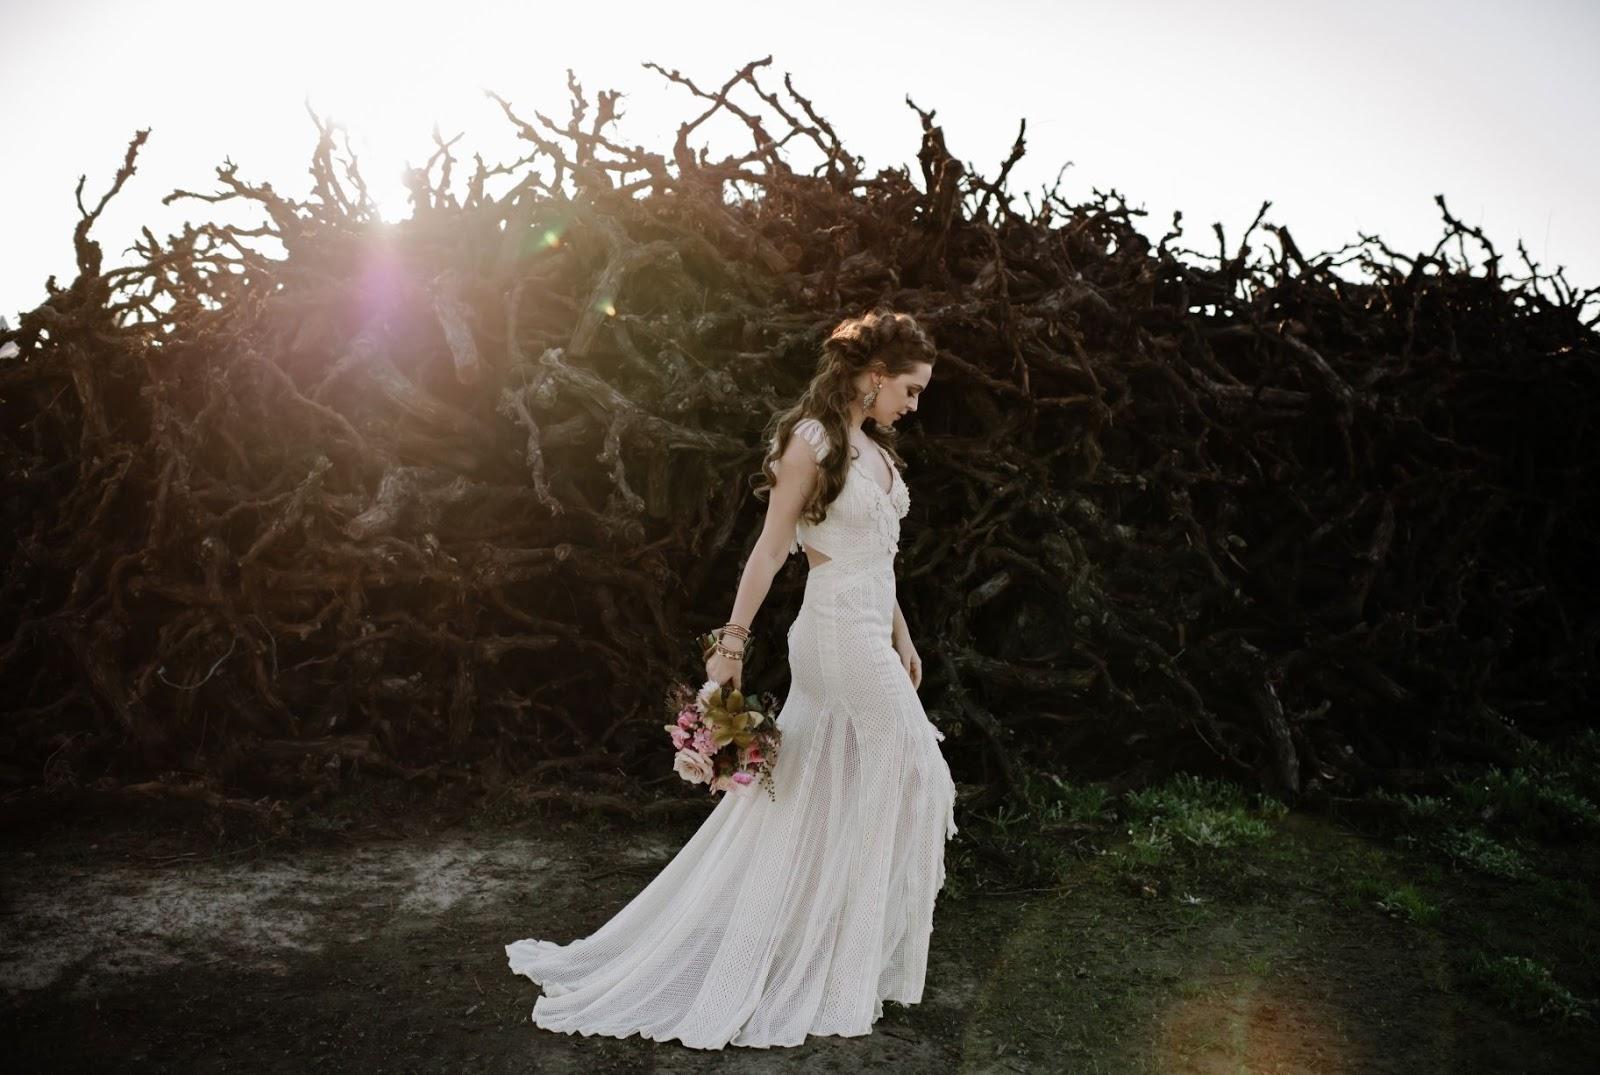 STYLED SHOOT: RICH PLUM HUES   LUXE BOHEMIAN BRIDAL INSPIRATION PERTH WA